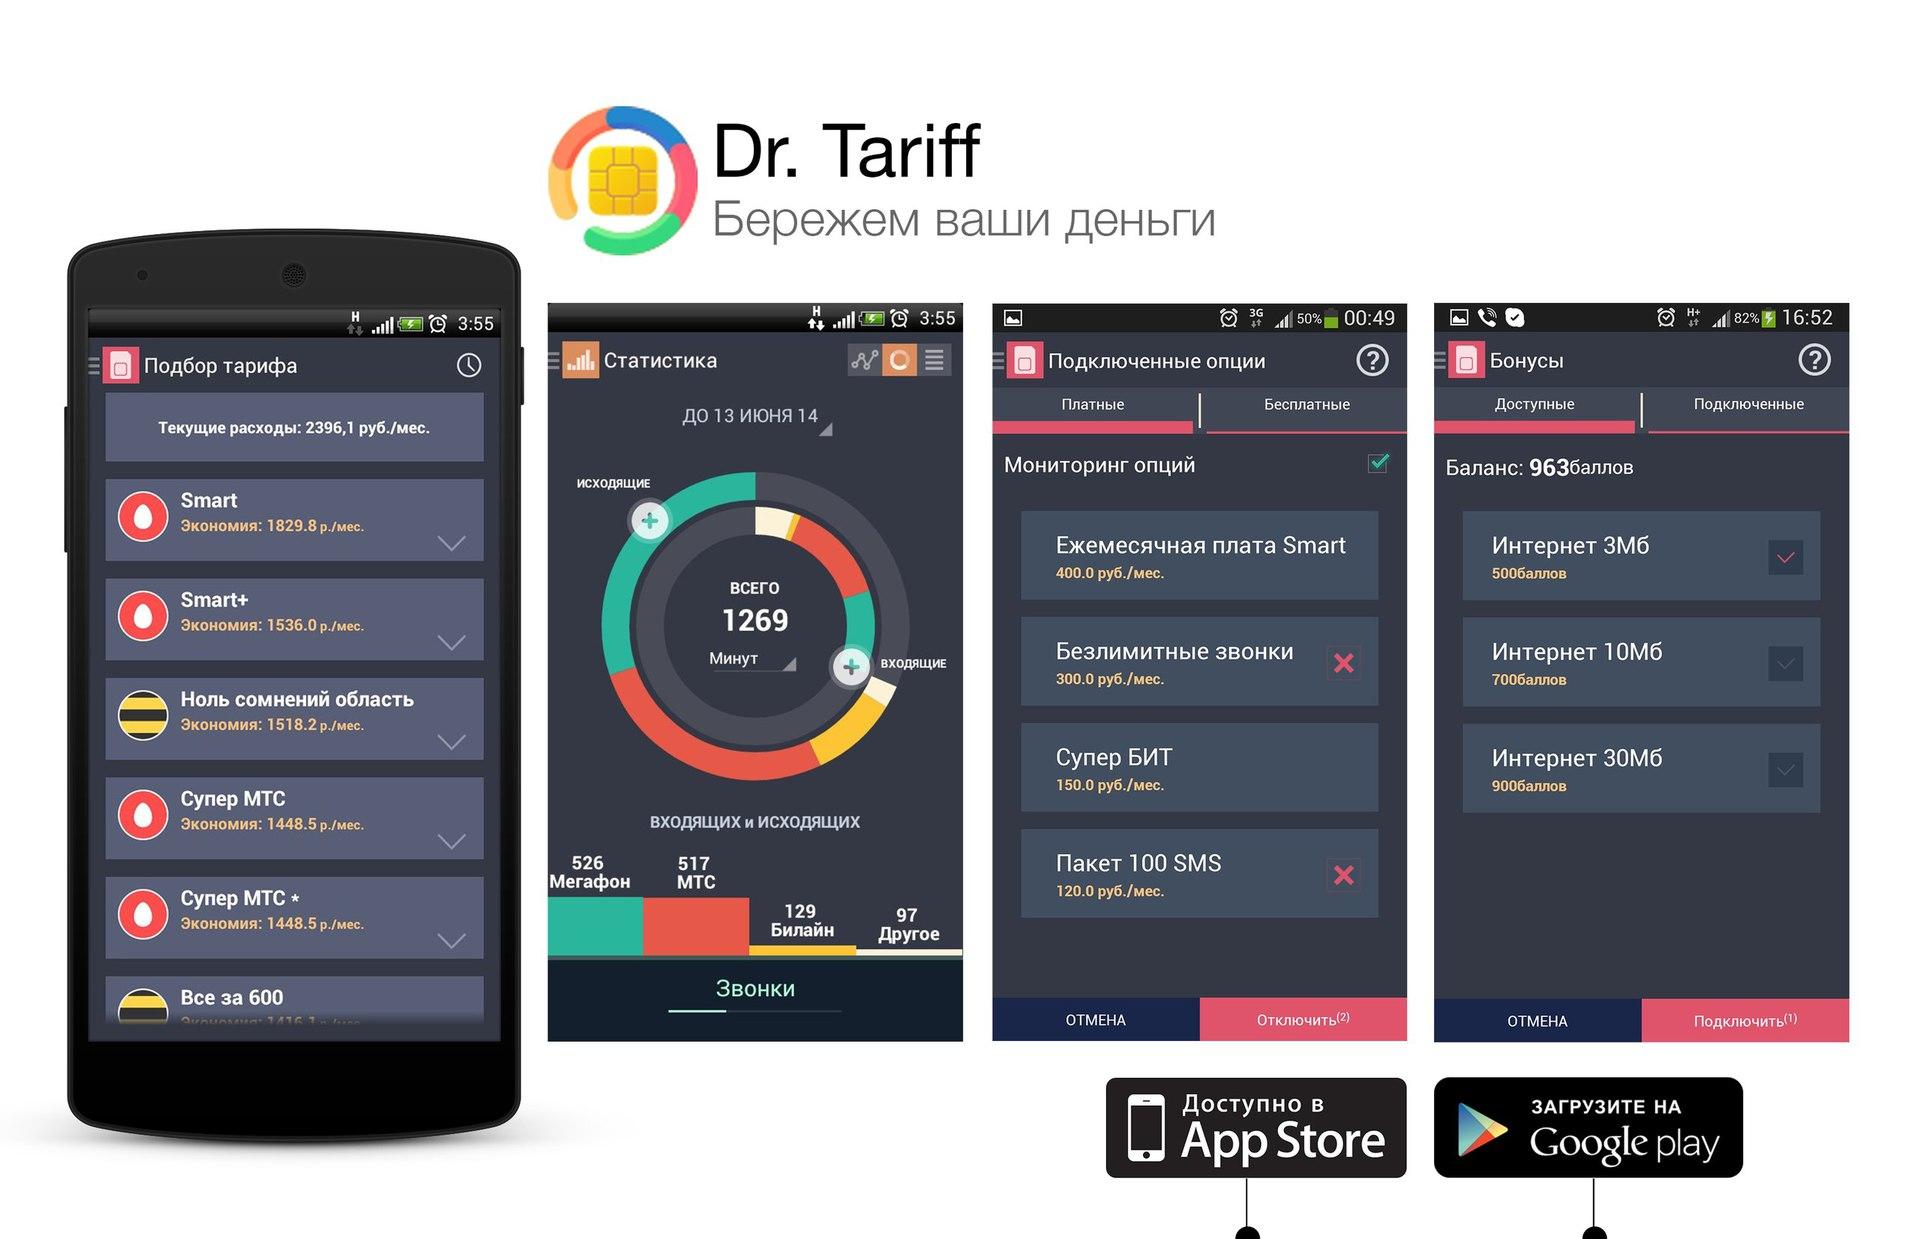 Dr. Tariff 2.0: новые возможности для абонентов Билайн, МегаФон и МТС